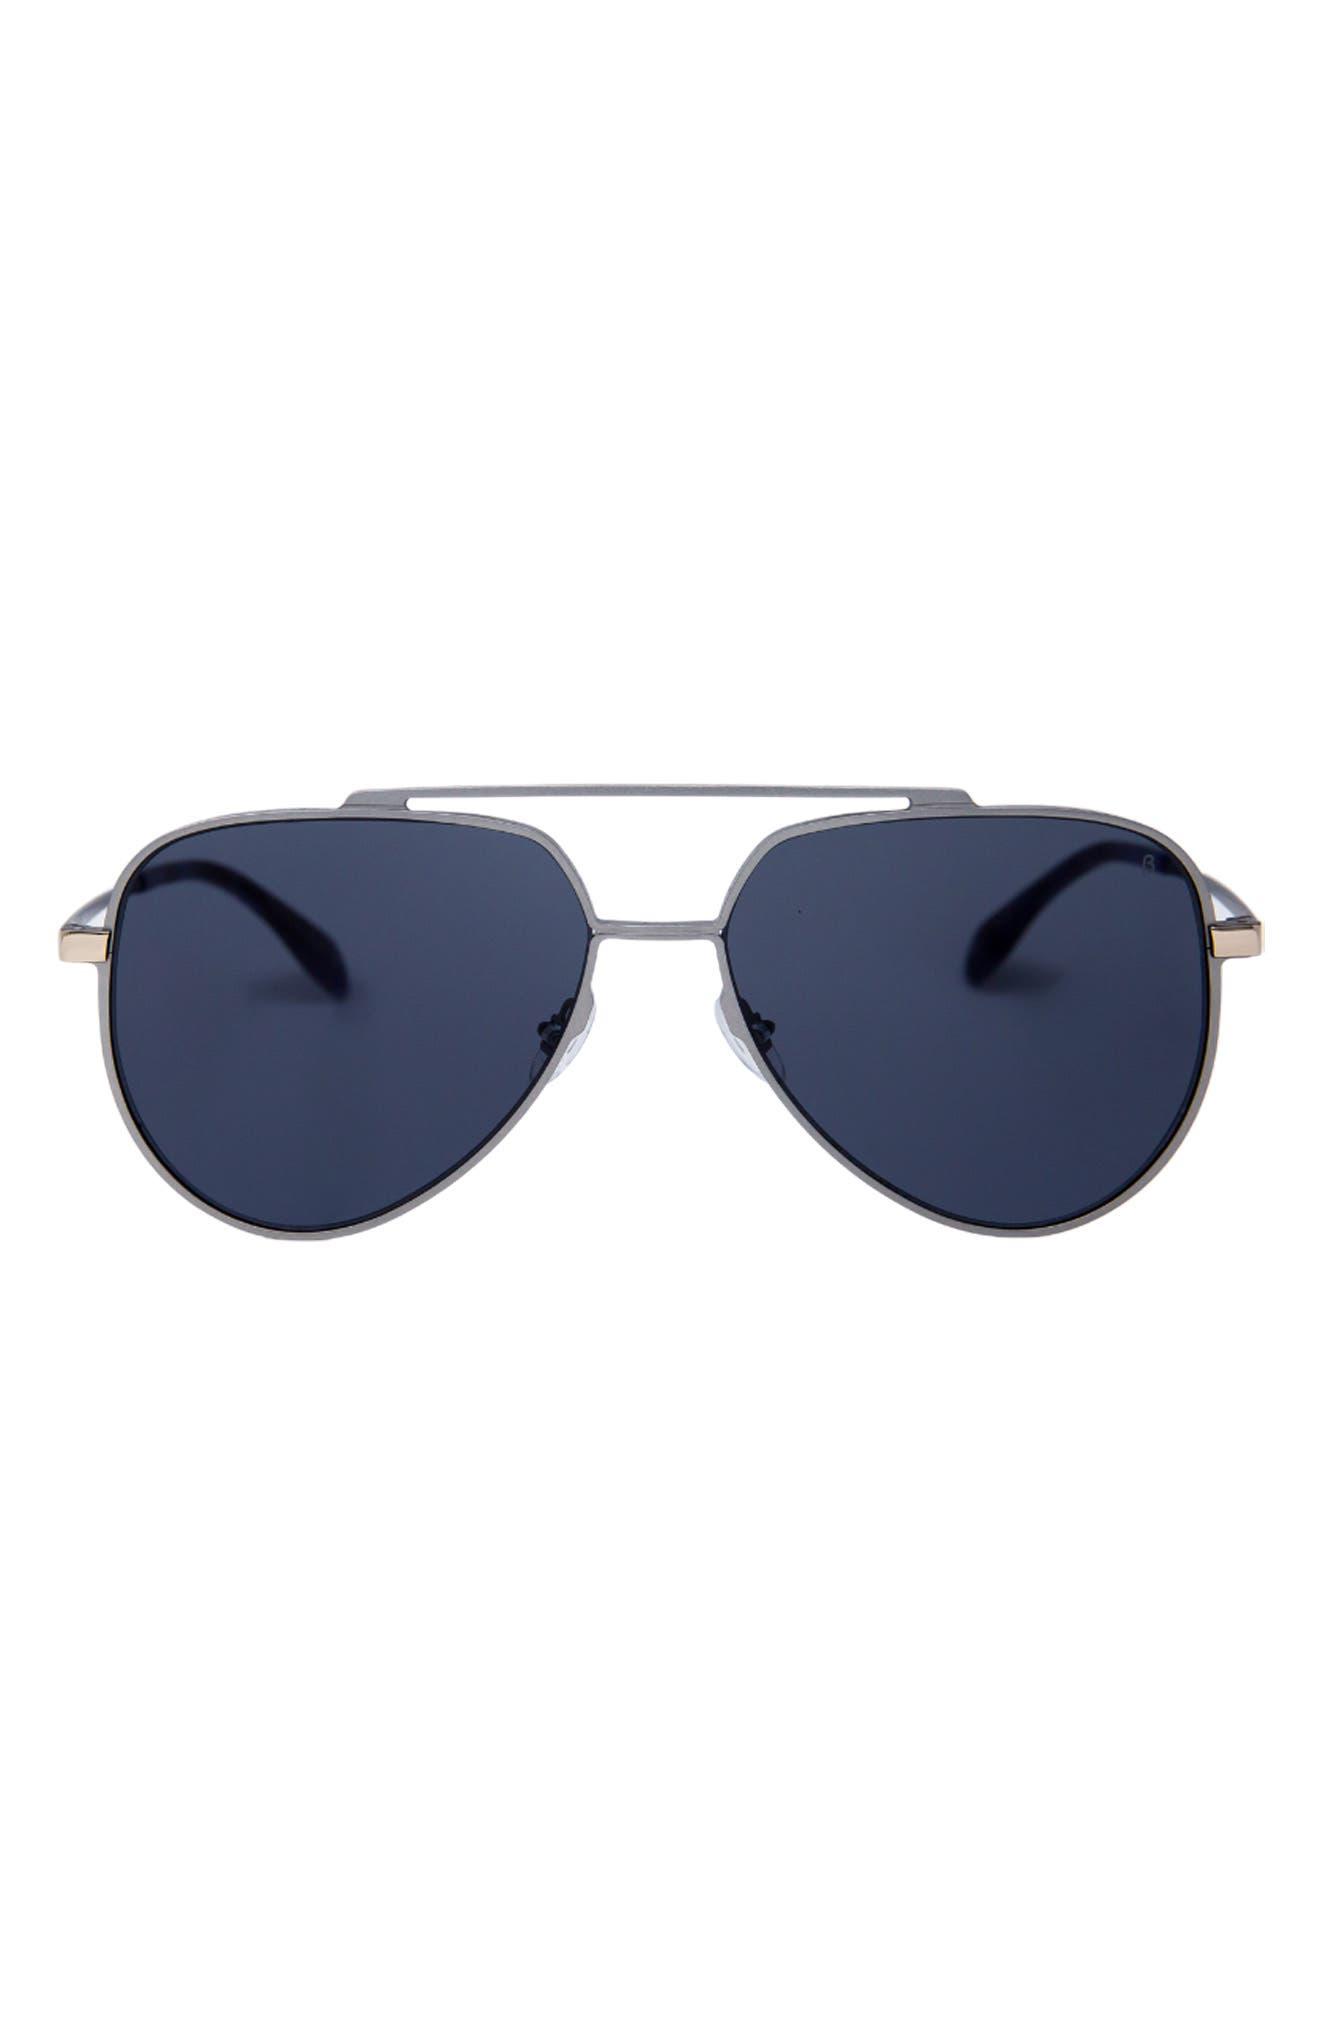 Vizcaya 58mm Aviator Sunglasses